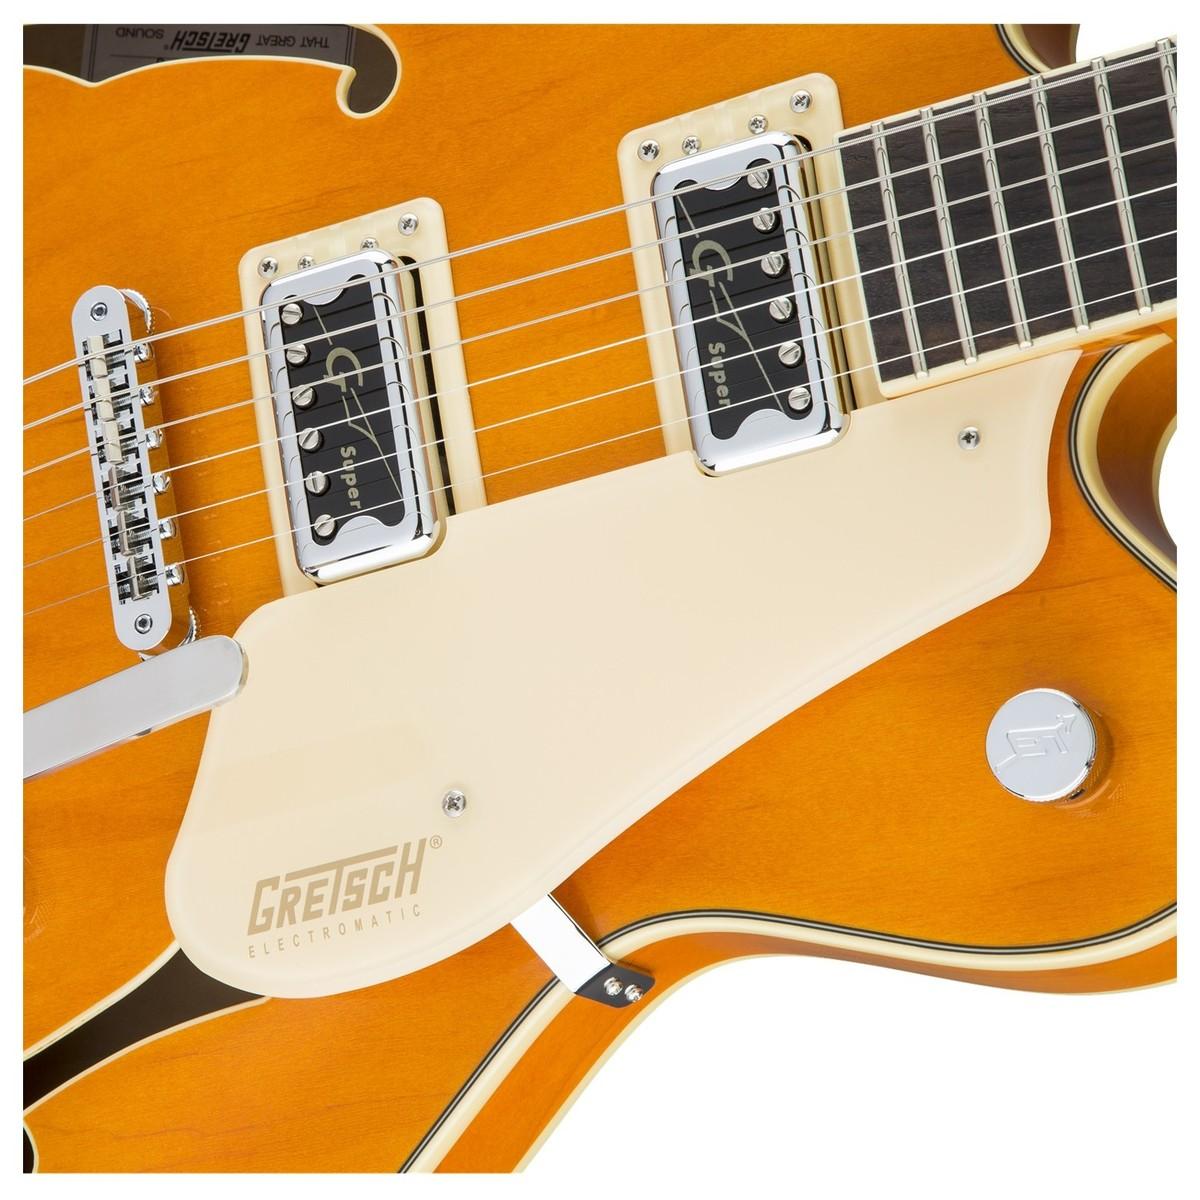 gretsch g5622t electromatic center block vintage orange at gear4music. Black Bedroom Furniture Sets. Home Design Ideas